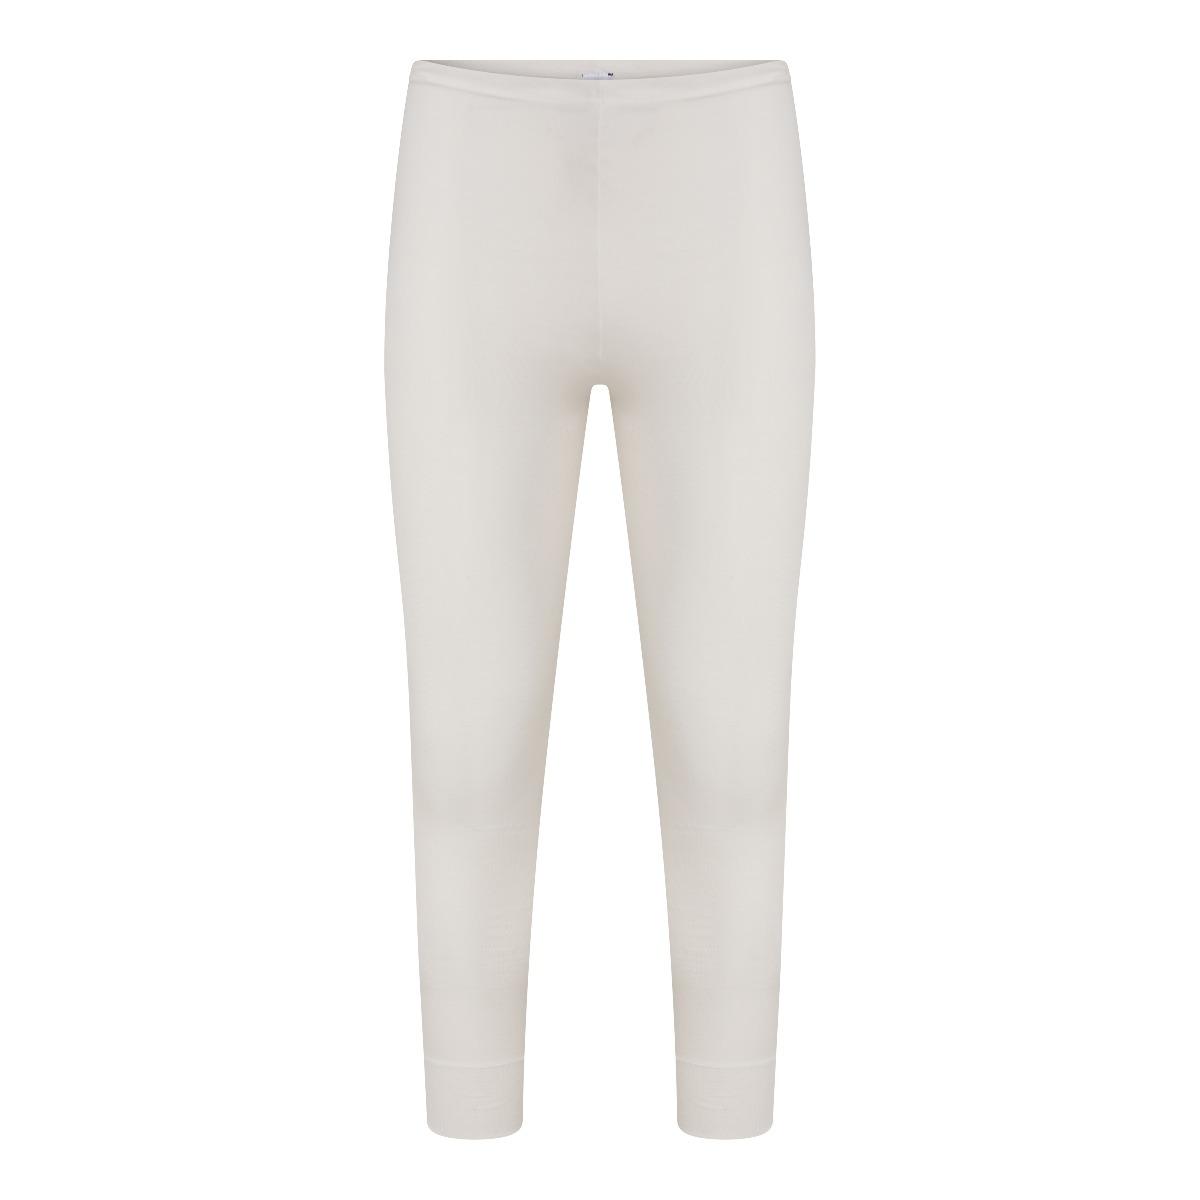 Beeren Thermo Unisex Pantalon Wolwit L